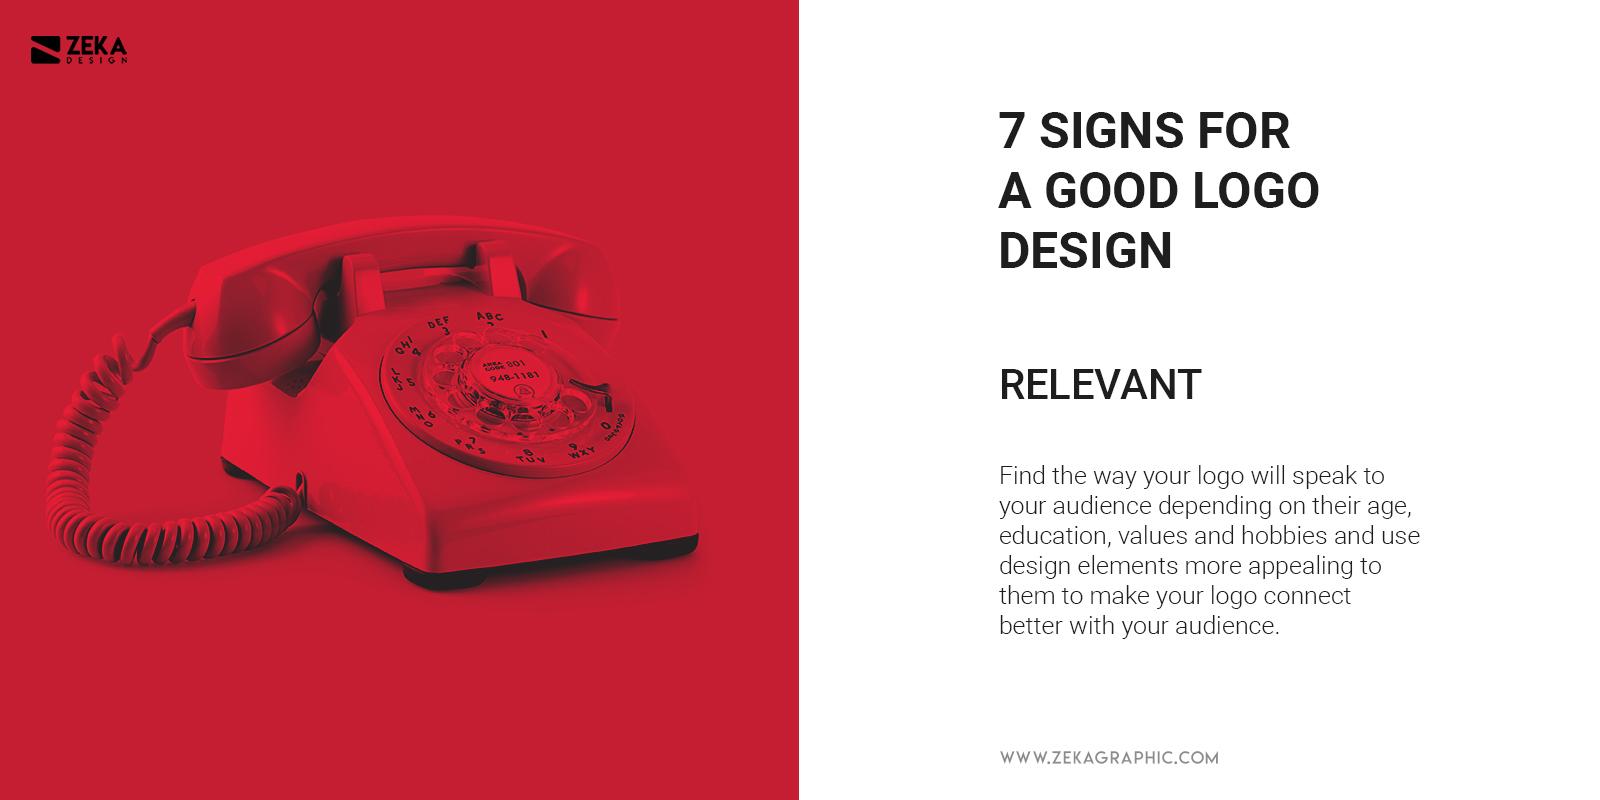 Relevant Logo Design Quality What Makes Good Logo Design